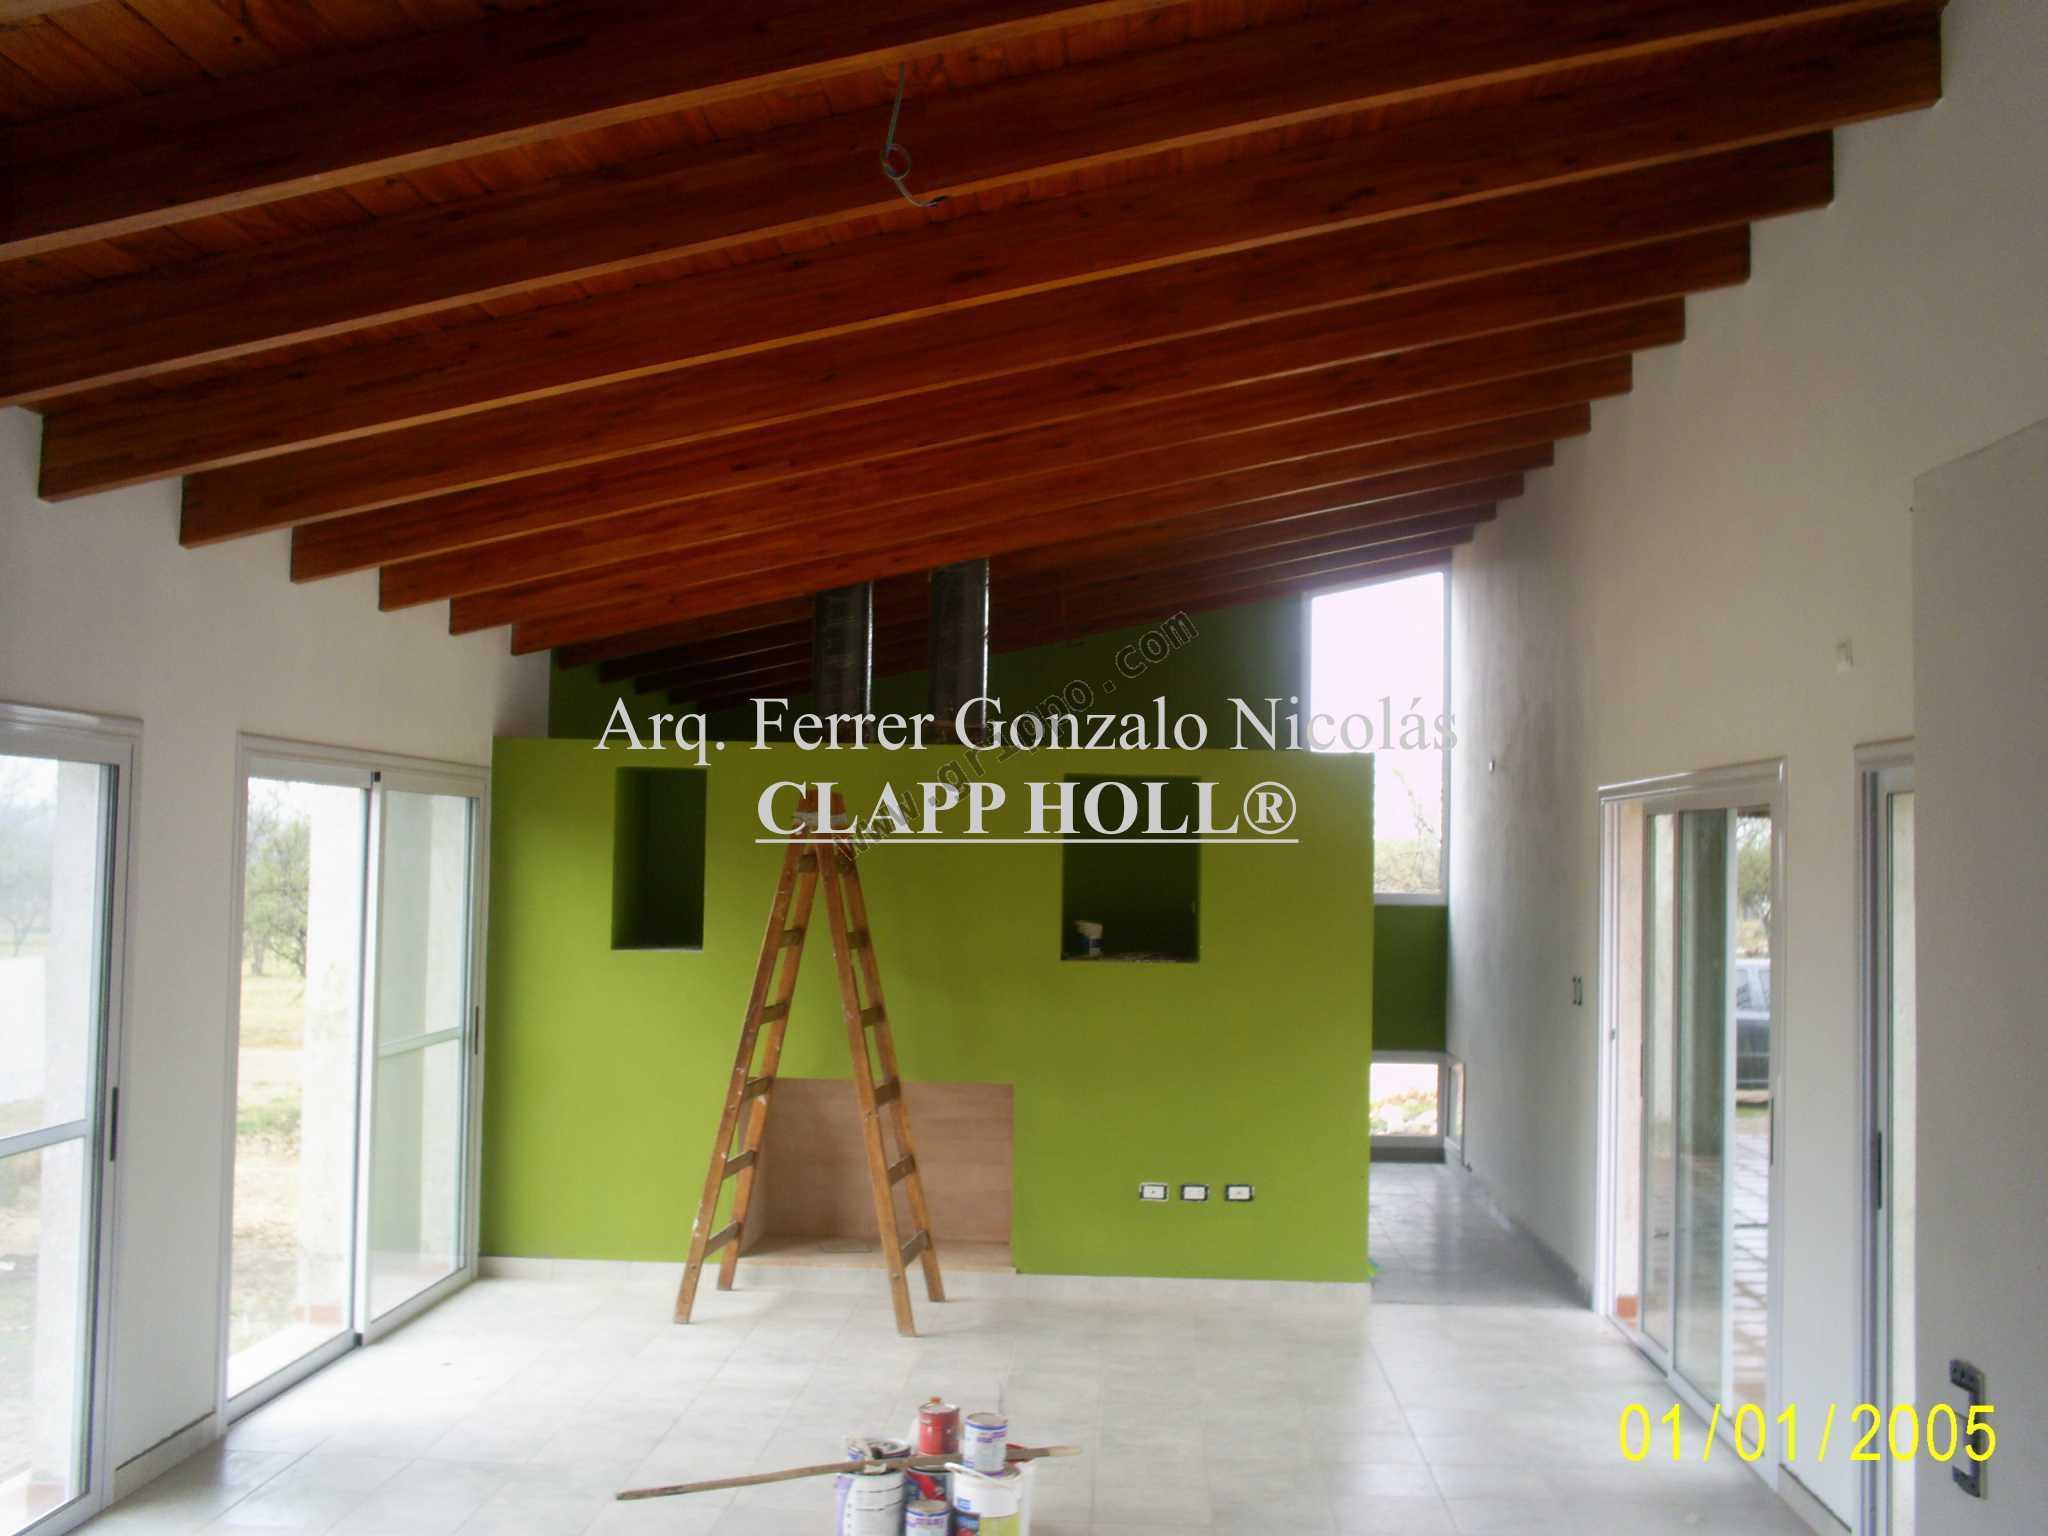 Arquitecto especialista en techos cordoba - Arquitectos en cordoba ...